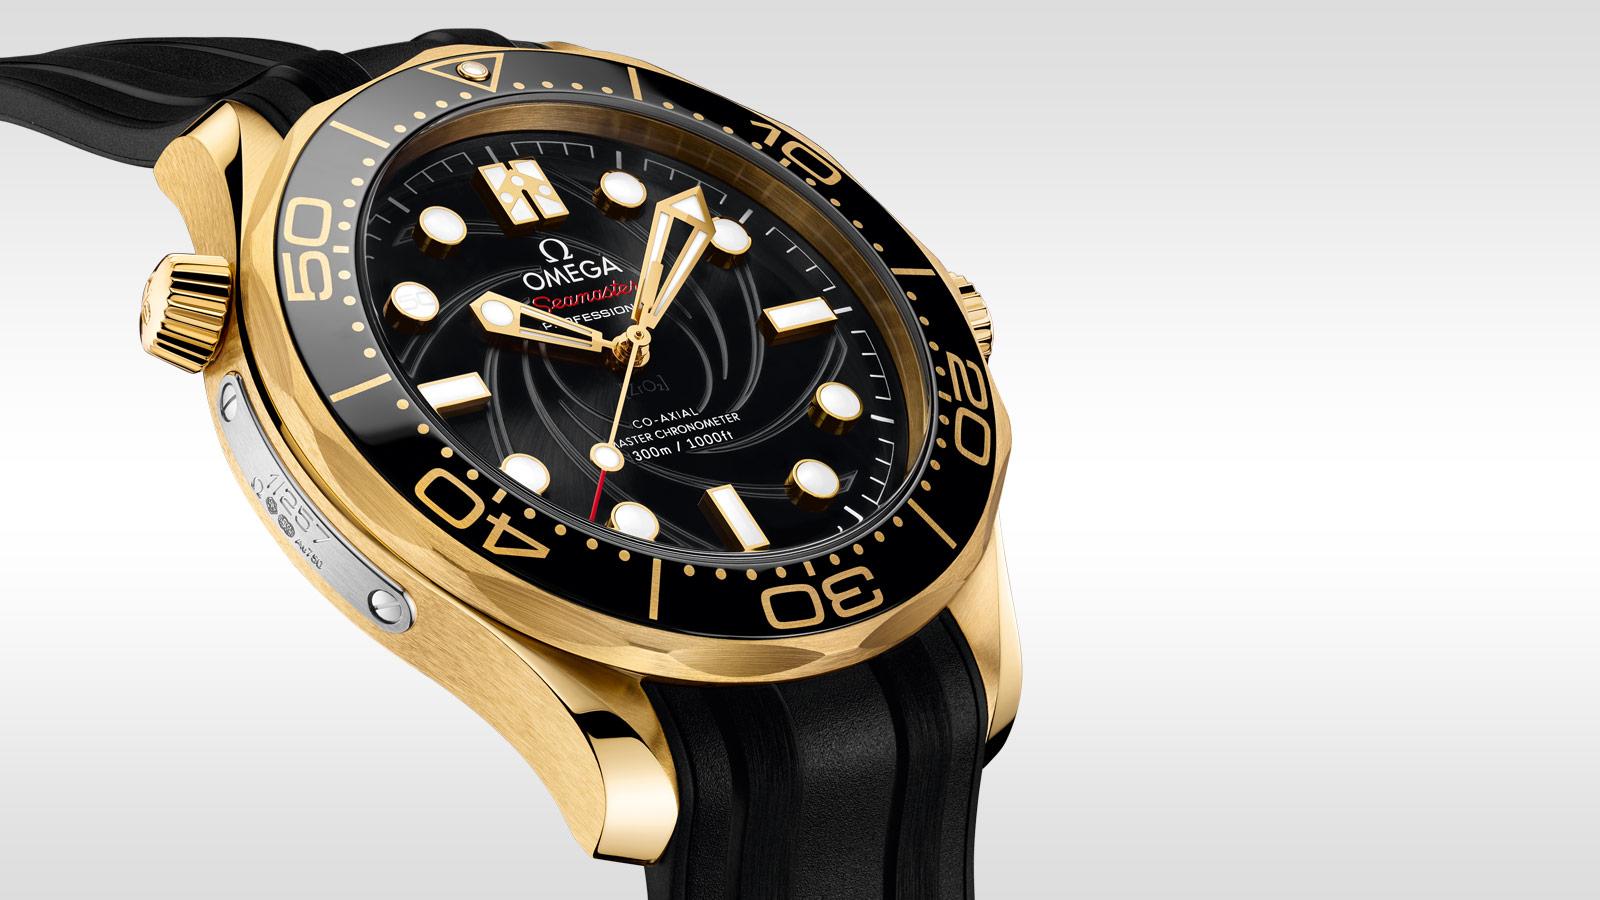 Seamaster 300米潜水表 300米潜水表 欧米茄同轴•至臻天文台表42毫米 - 210.62.42.20.01.001 - 查看 1